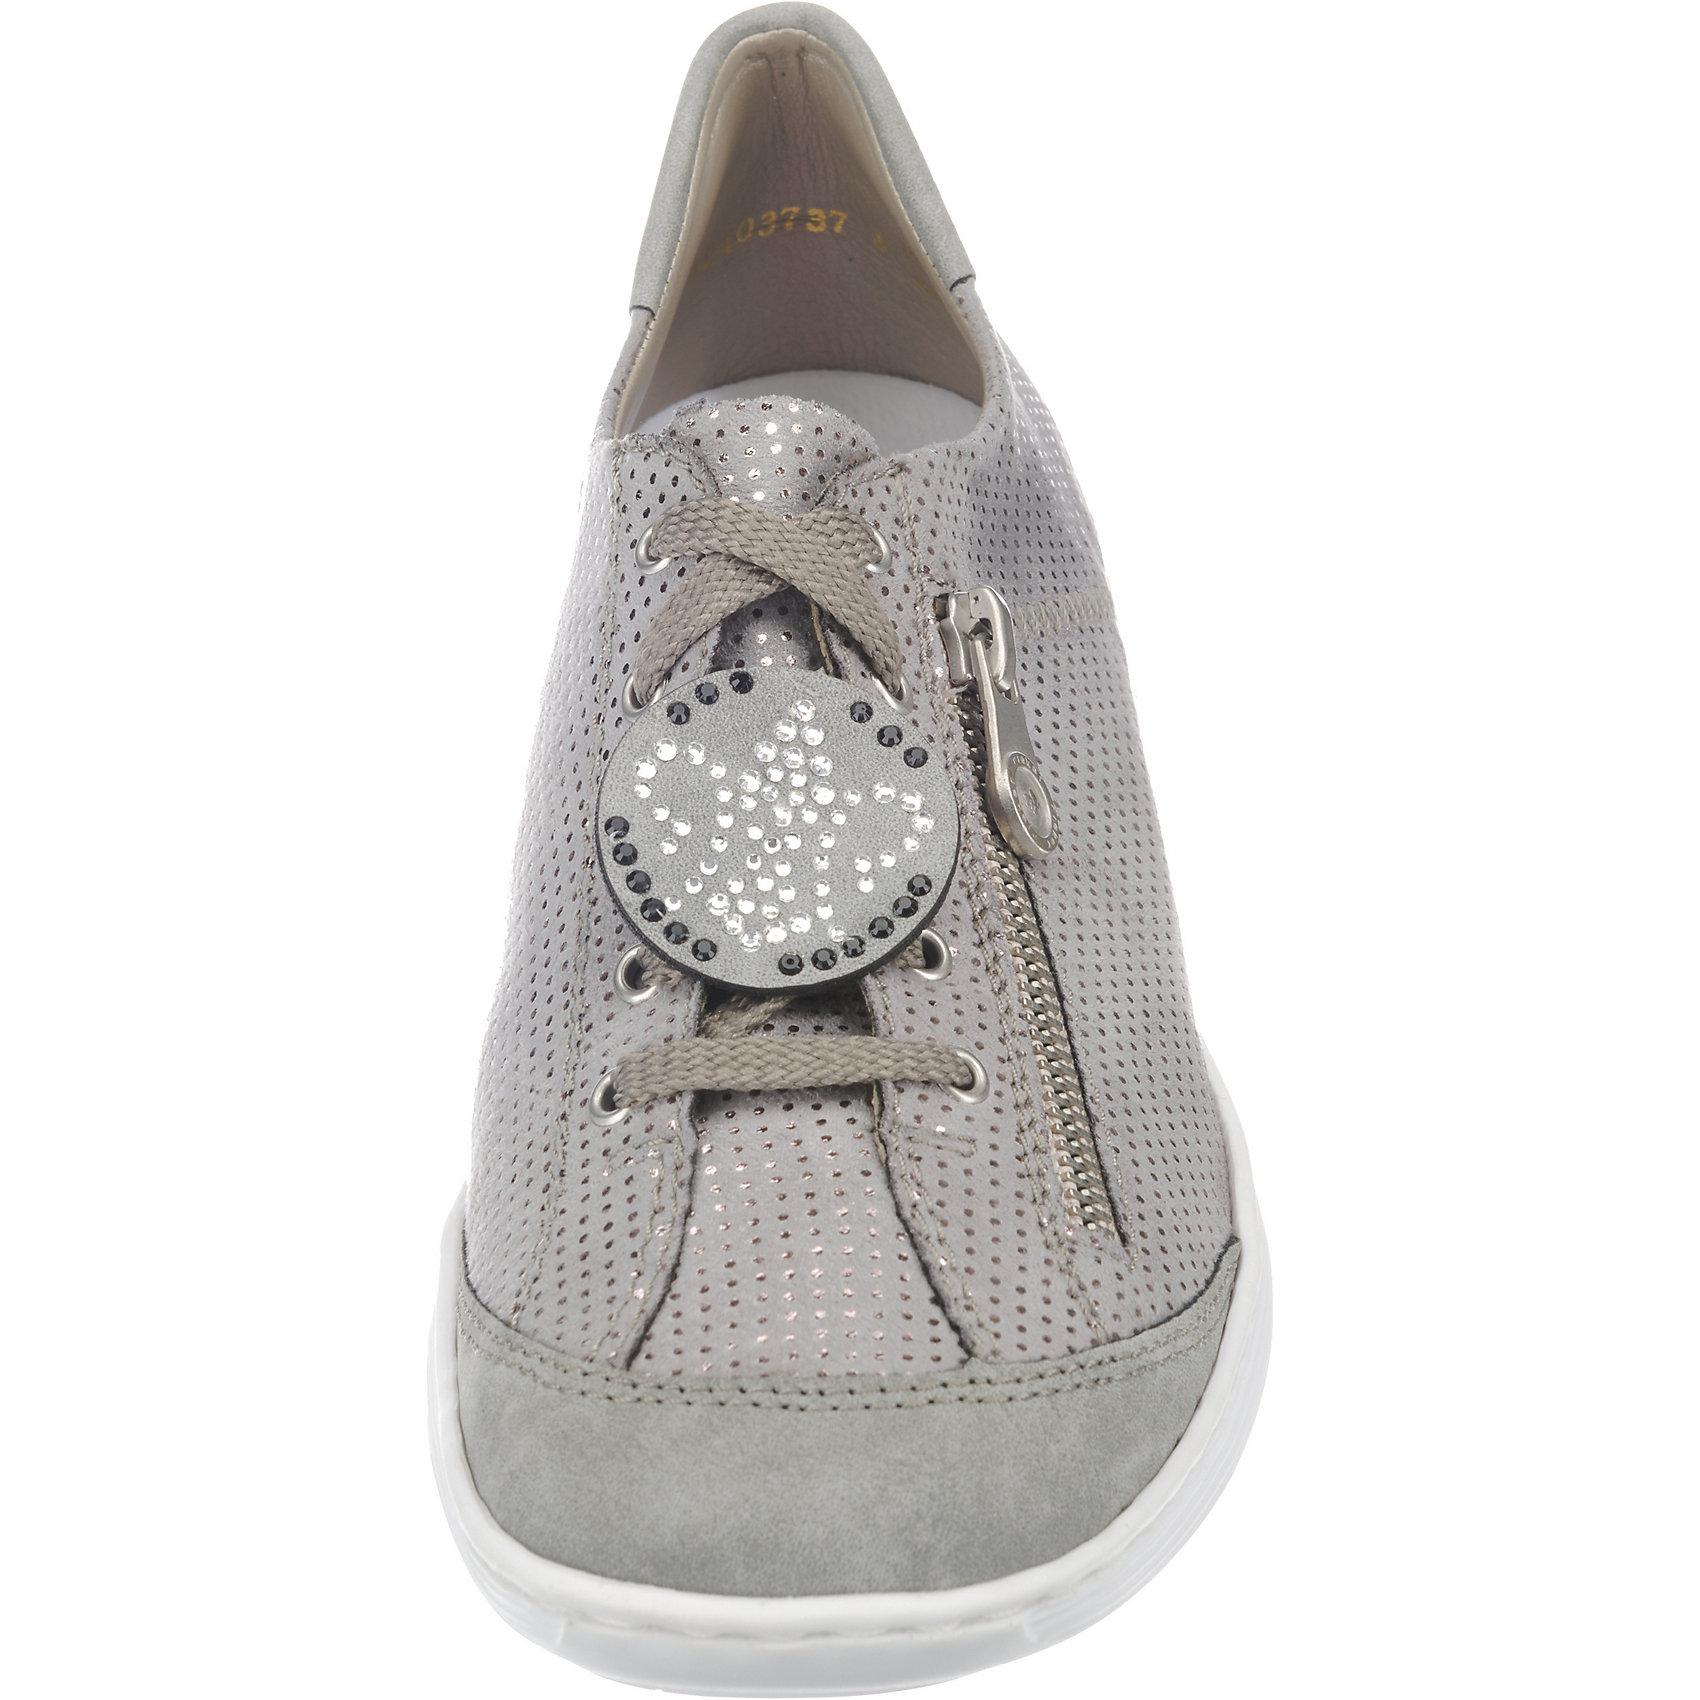 Neu-rieker-Sneakers-7122289-fuer-Damen-grau